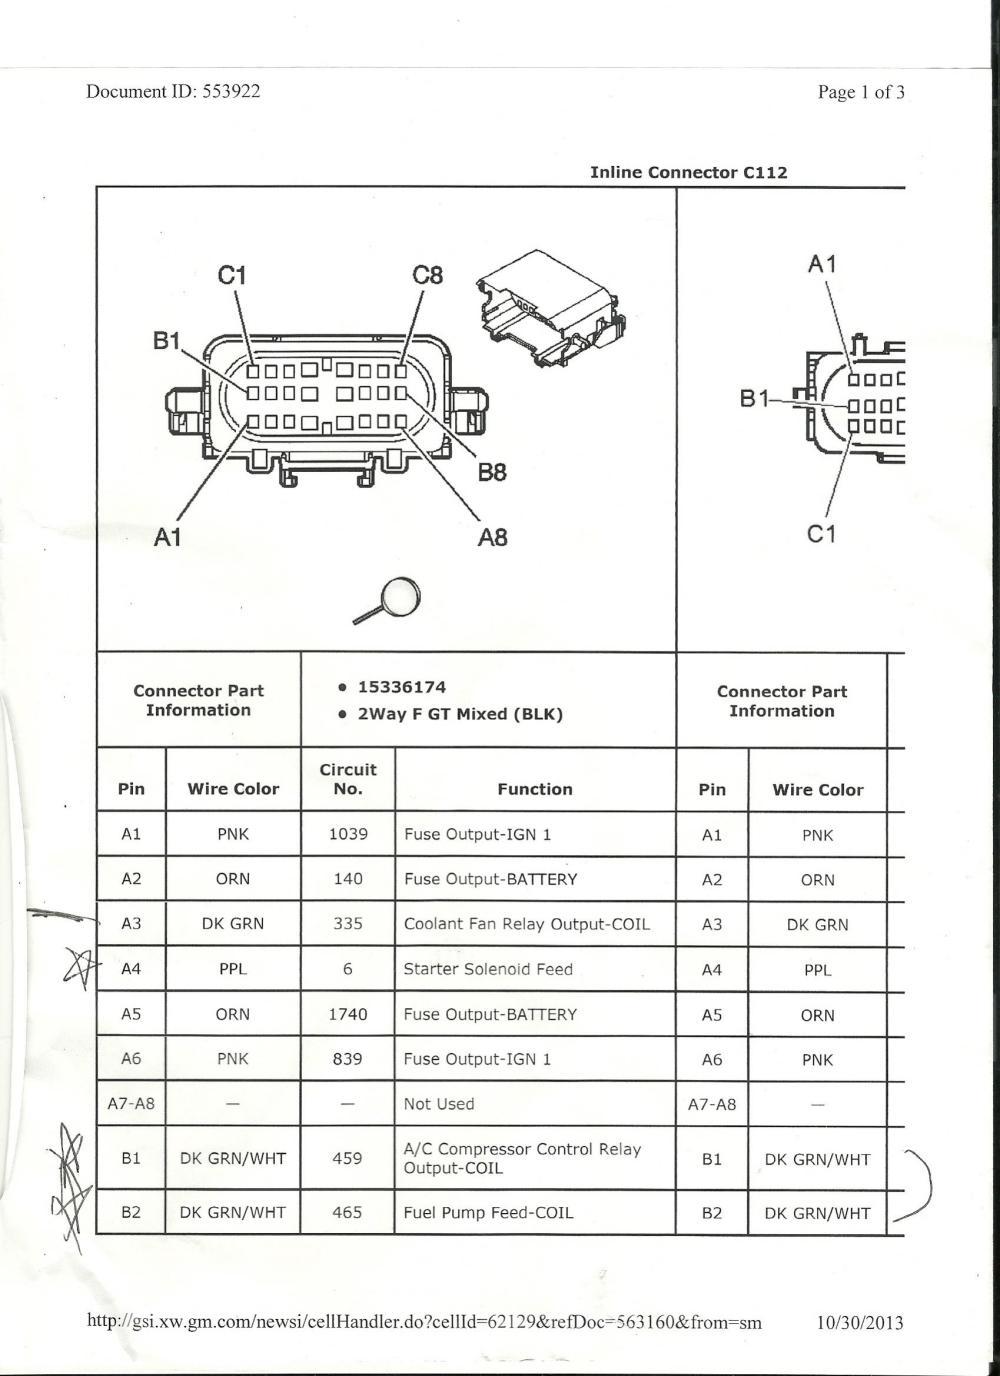 medium resolution of wiring diagram also electrical wiring diagram 2000 chevy impala 2002 chevy impala electrical problems 2002 chevrolet impala fuse box